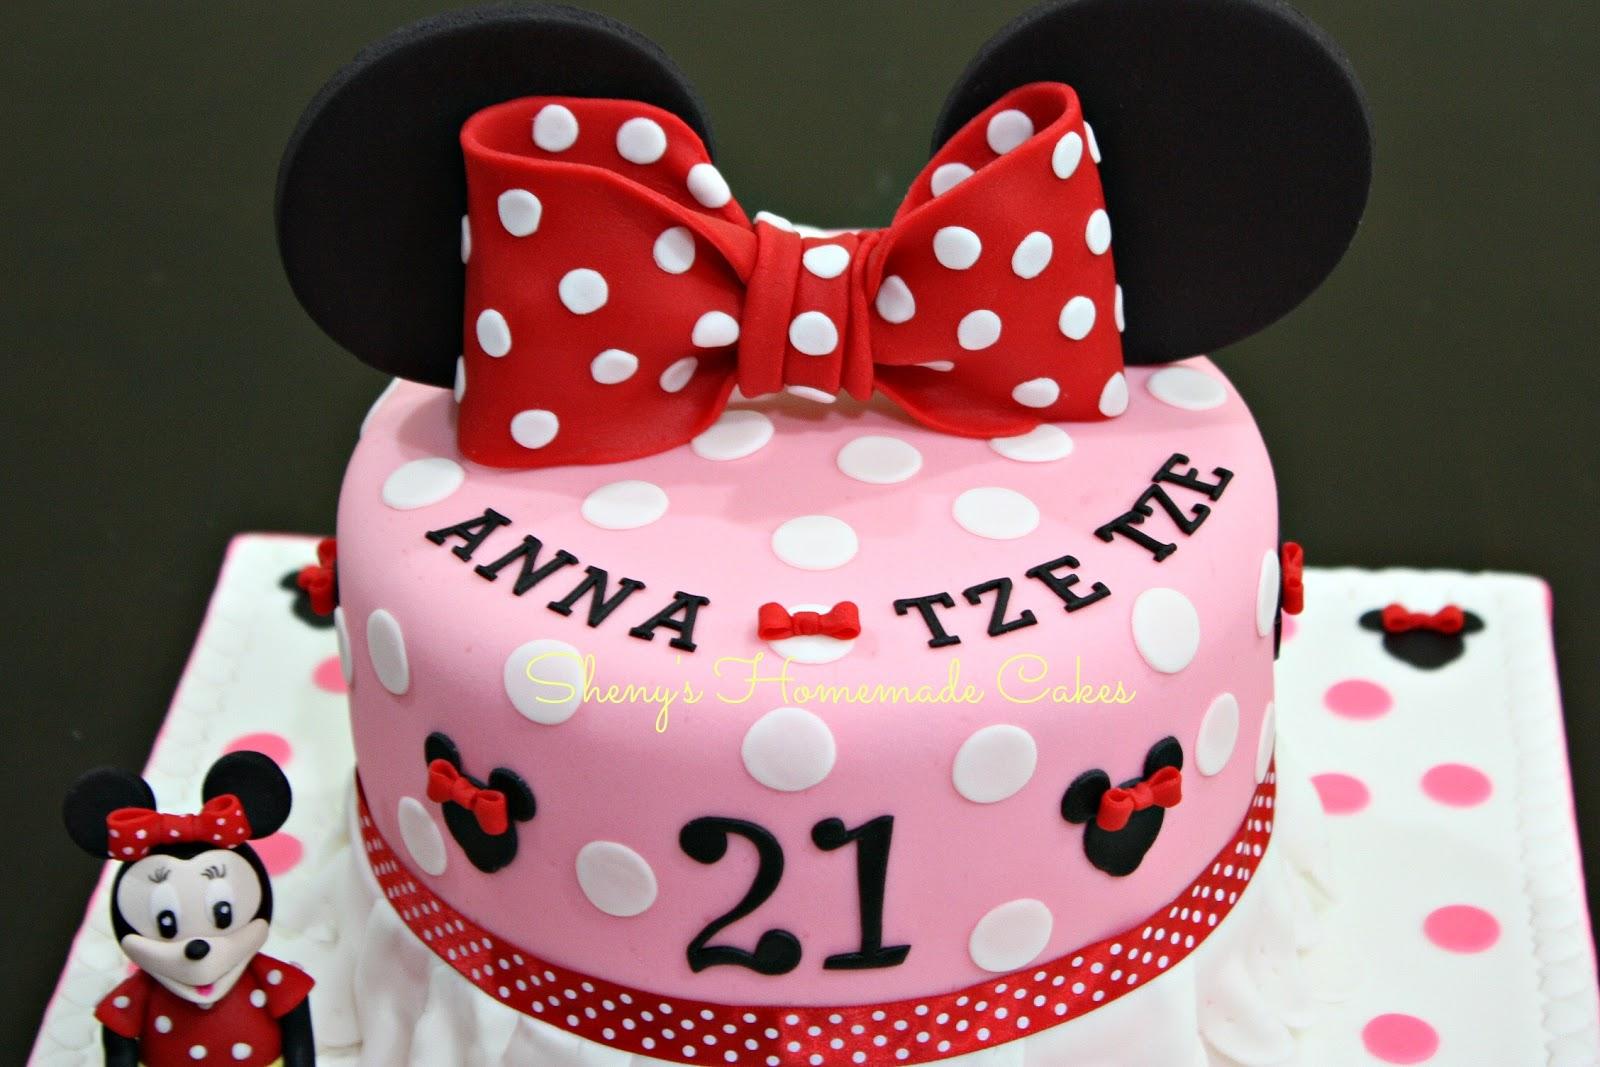 Astonishing Birthday Cakes Minnie Mouse The Cake Boutique Funny Birthday Cards Online Amentibdeldamsfinfo